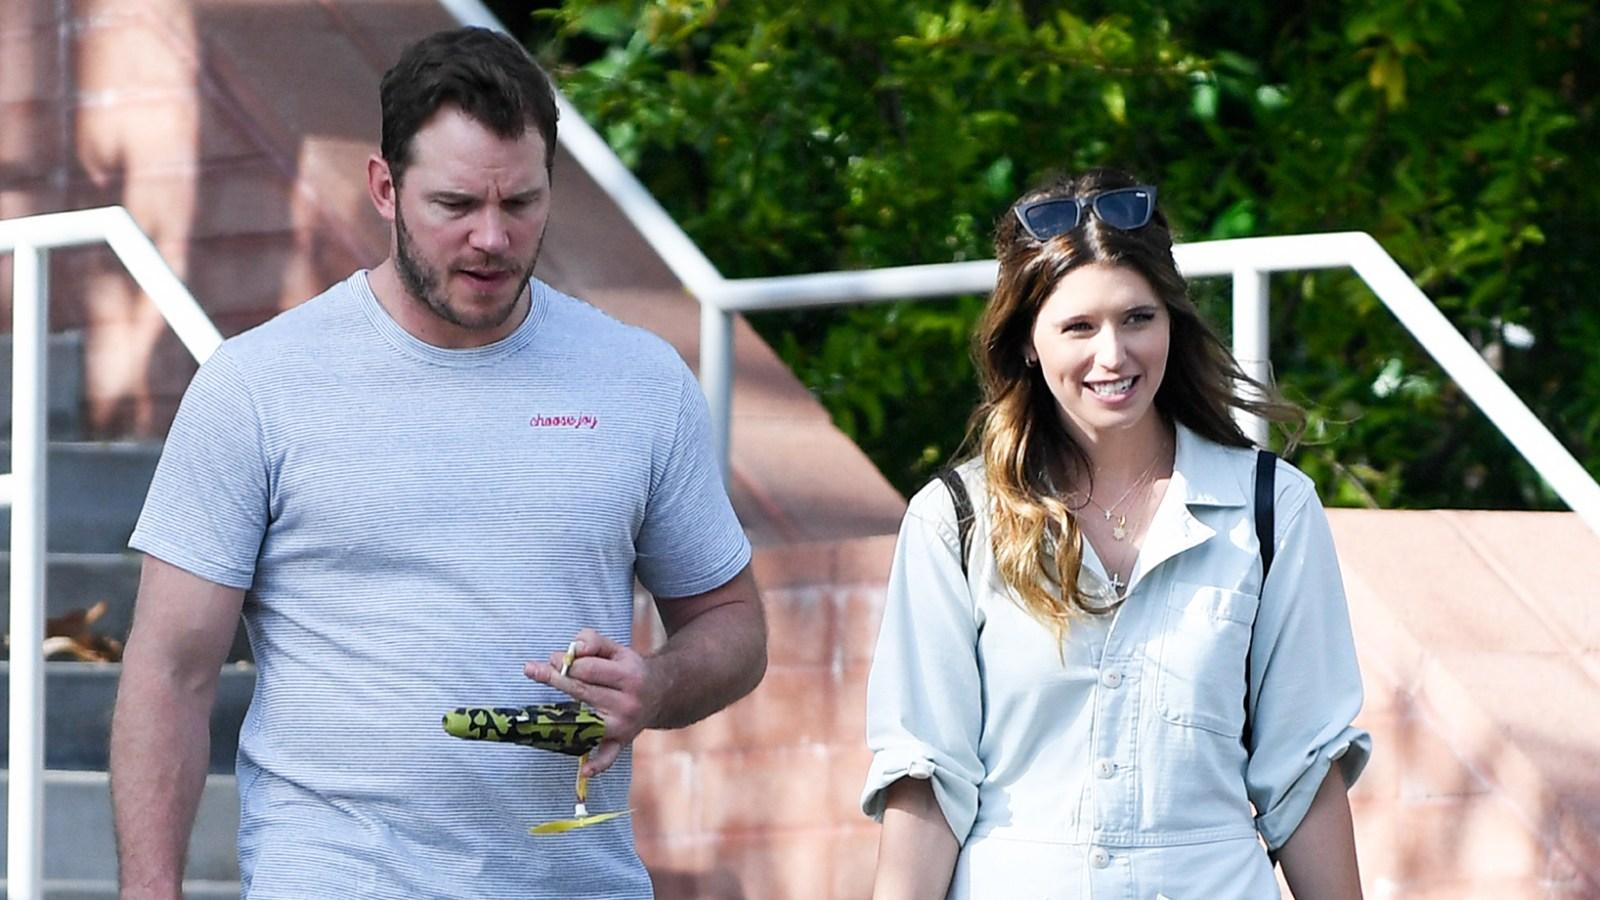 Chris Pratt and Katherine Schwarzenegger Will Be 'Engaged Soon'